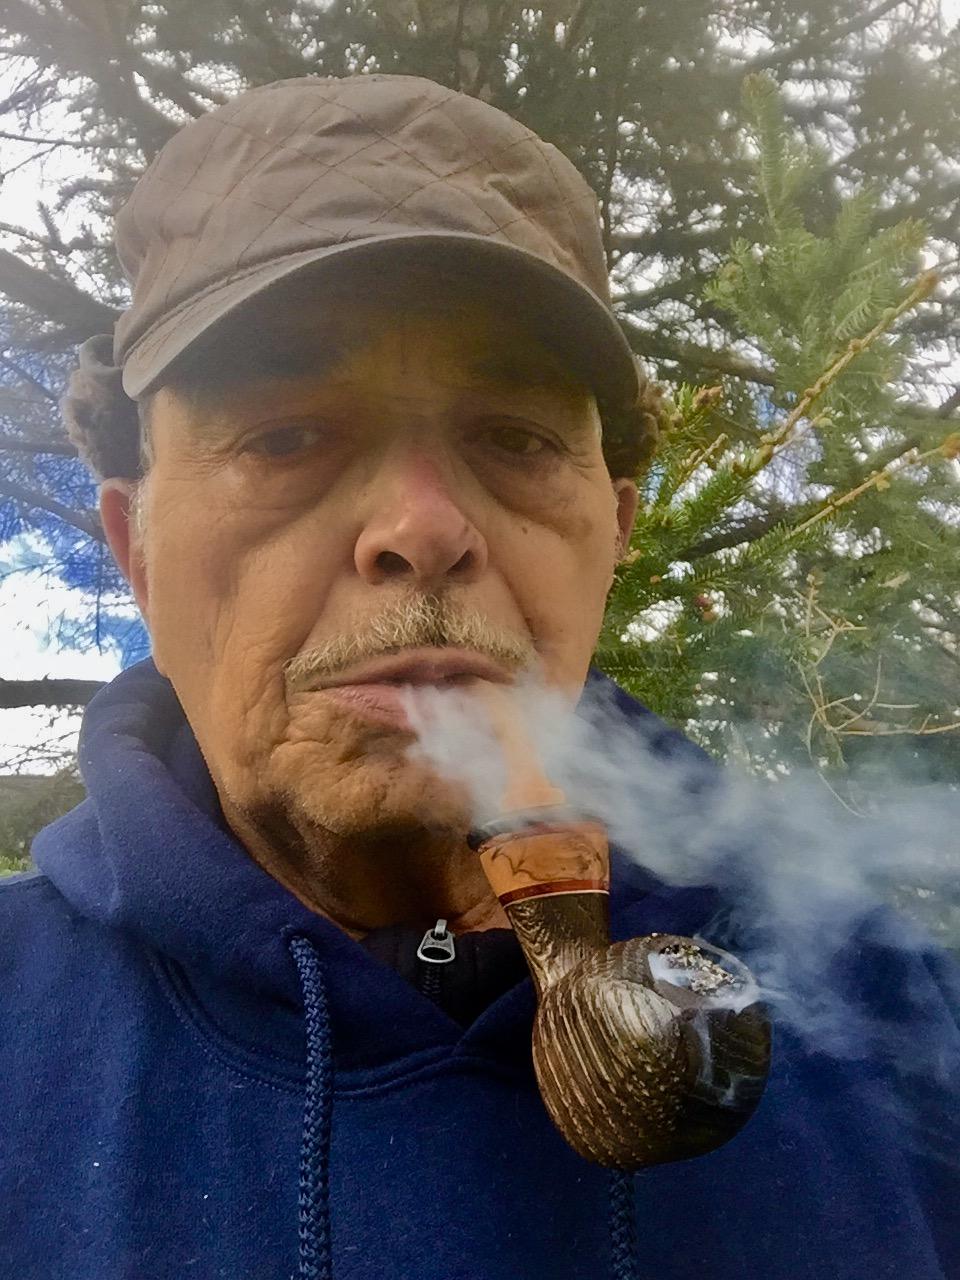 The pipe in my mouth that's a Morta  34539651566_58d73c1fcd_o_d